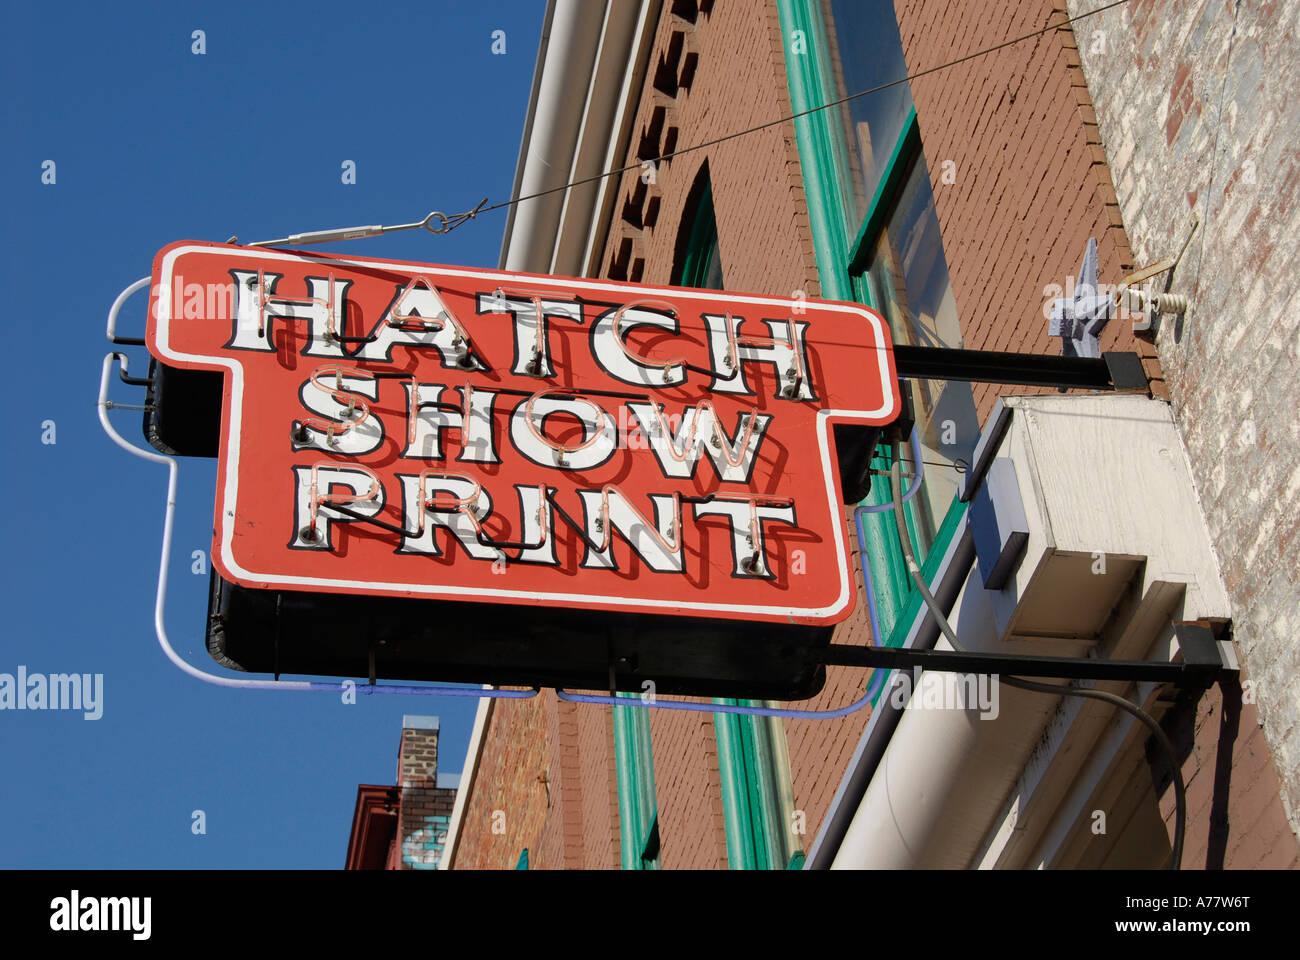 Hatch Show Print Stock Photos & Hatch Show Print Stock Images - Alamy